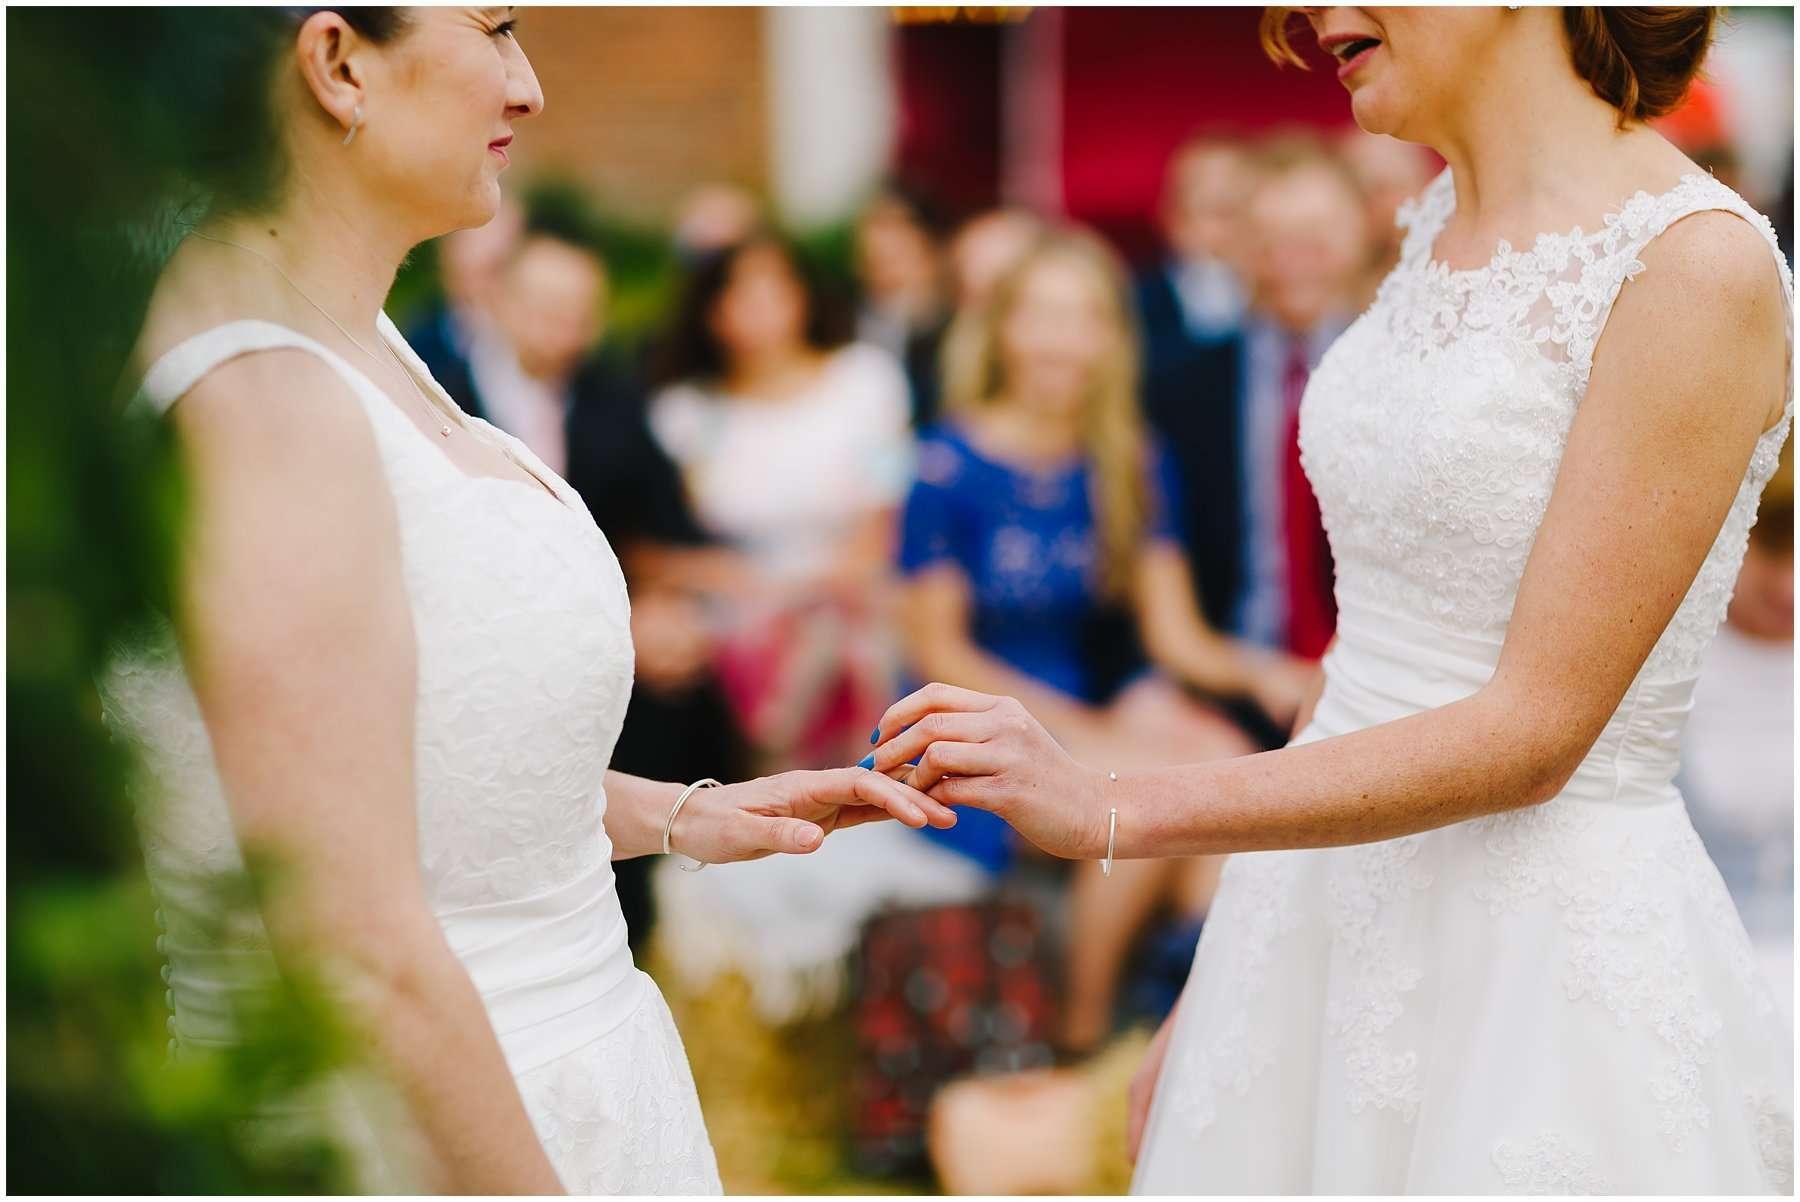 Andy Davison - Godwick Hall and Great Barn Wedding Photographer